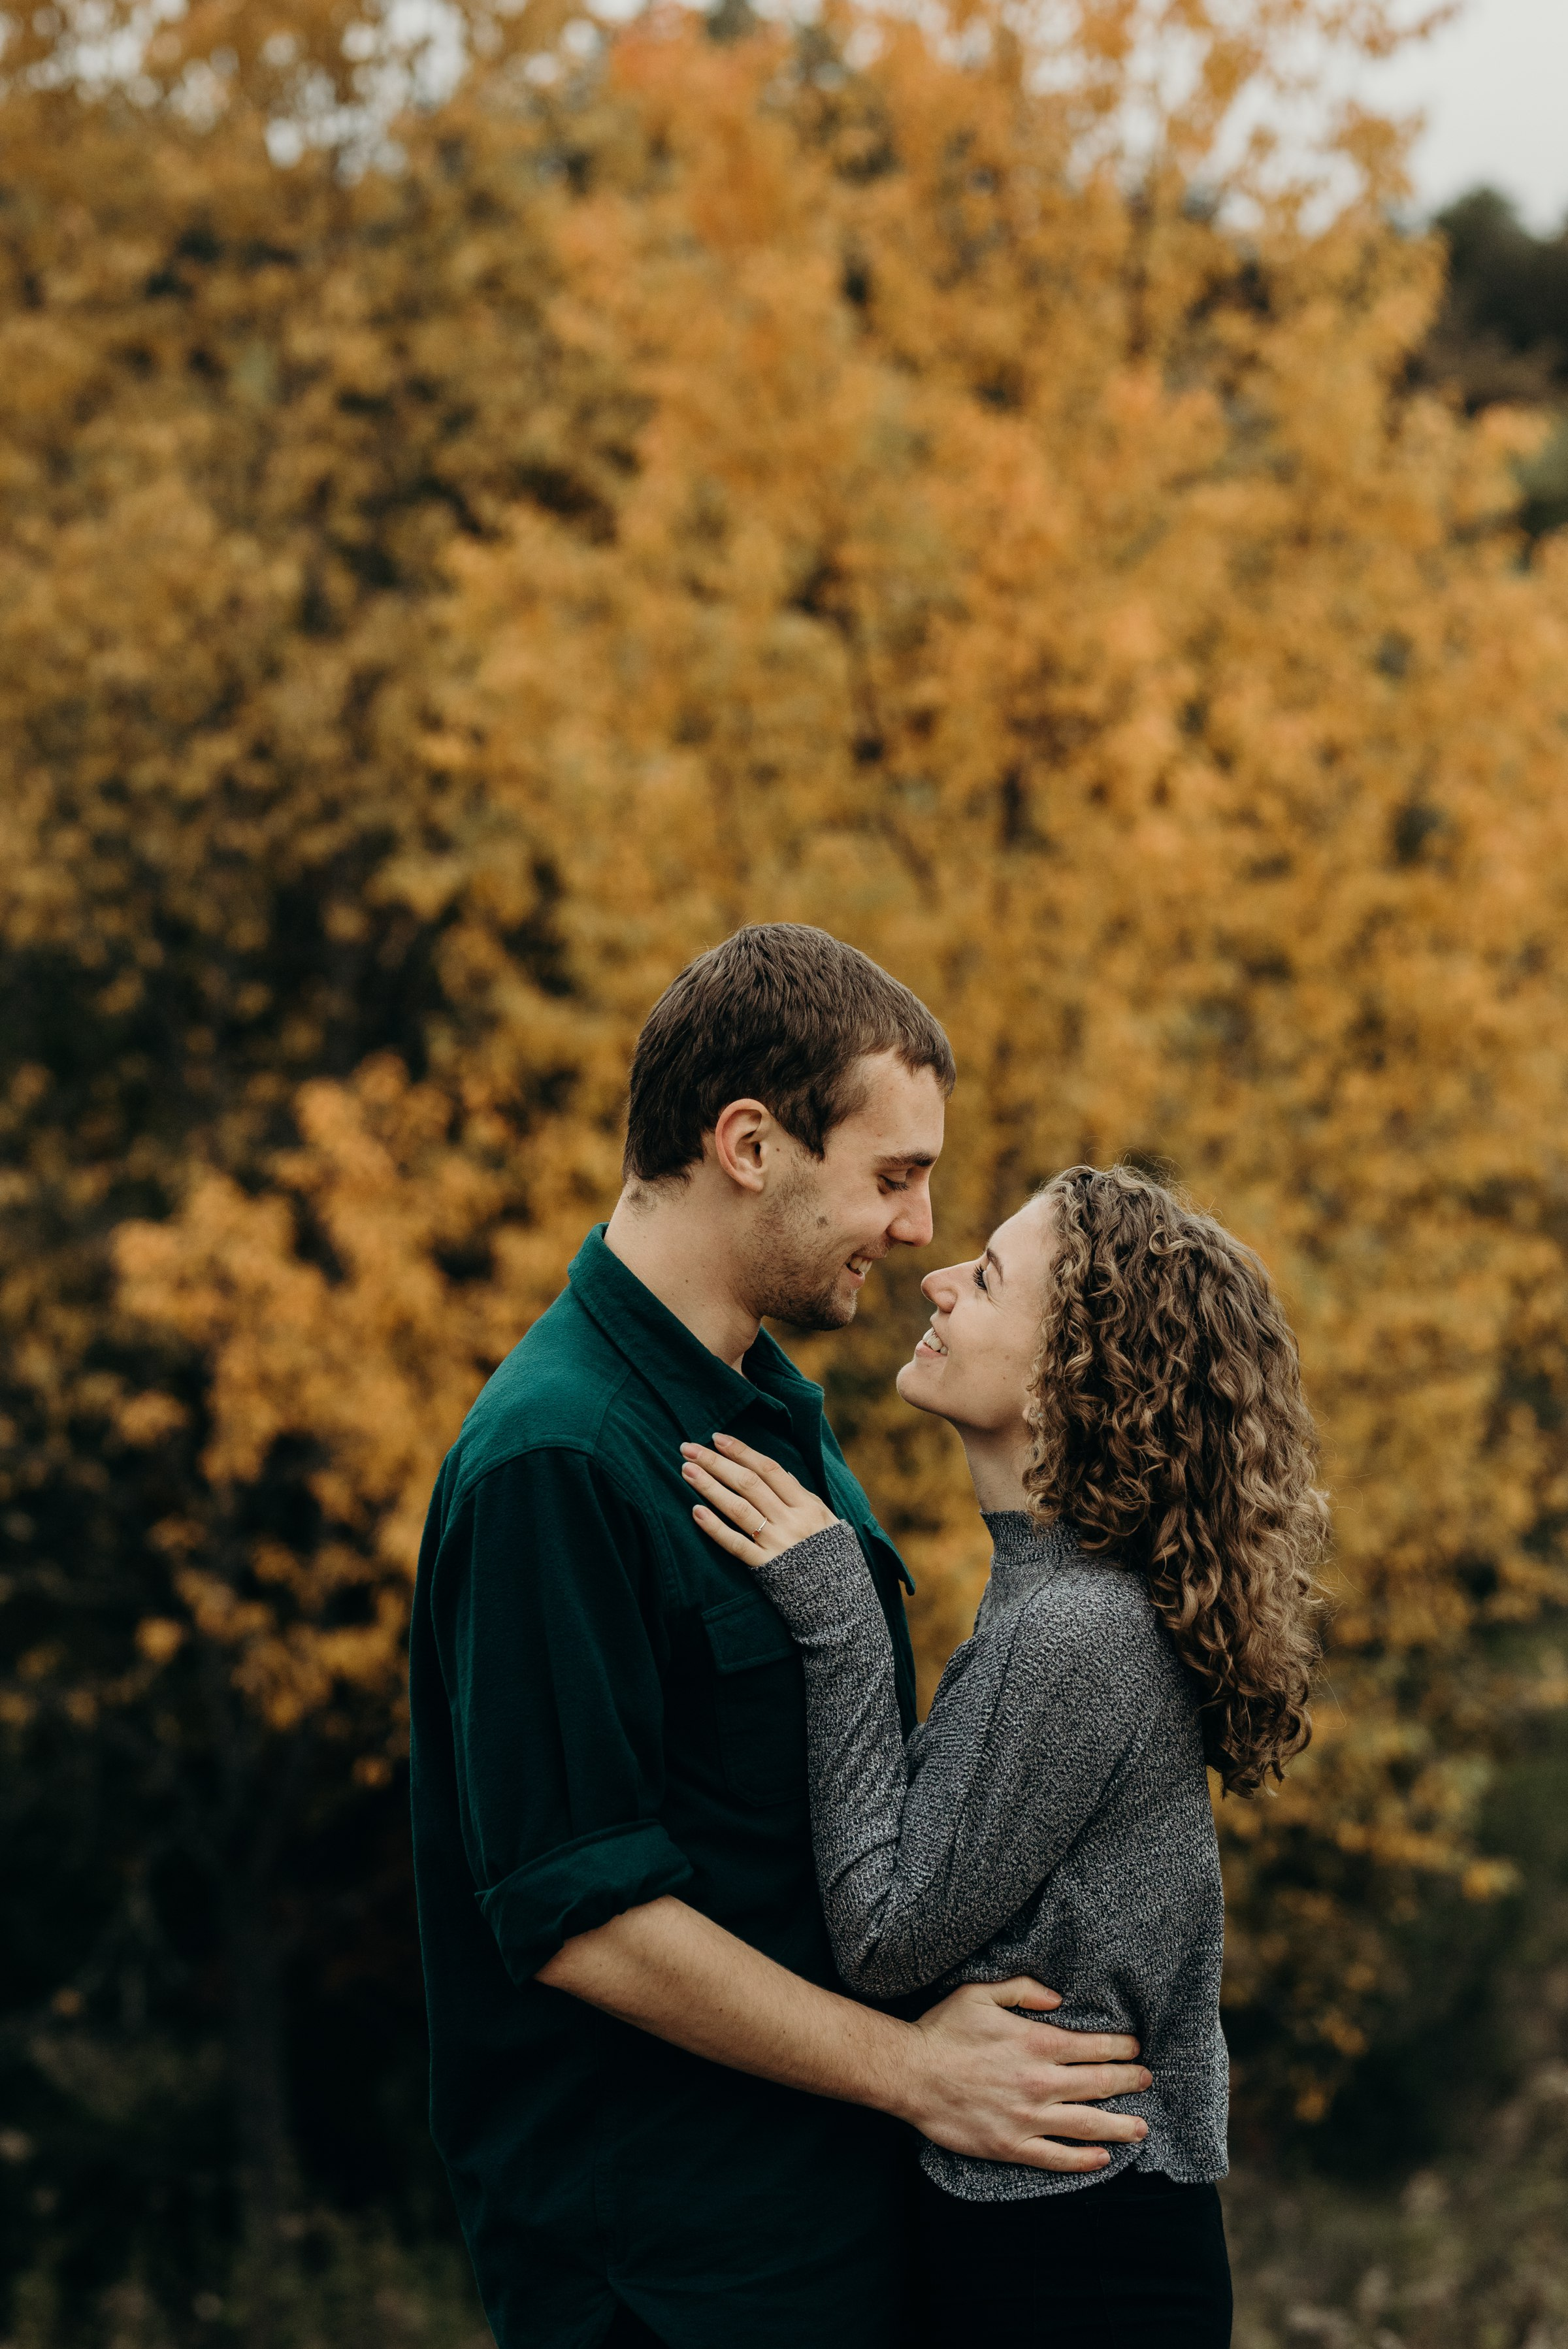 nickmezaphotography-austin-minneapolis-wedding-photographer-elopement-best-intimate-adventurous-destination-texas-minnesota-engagement-jess-dan-spacesaver_0164.jpg